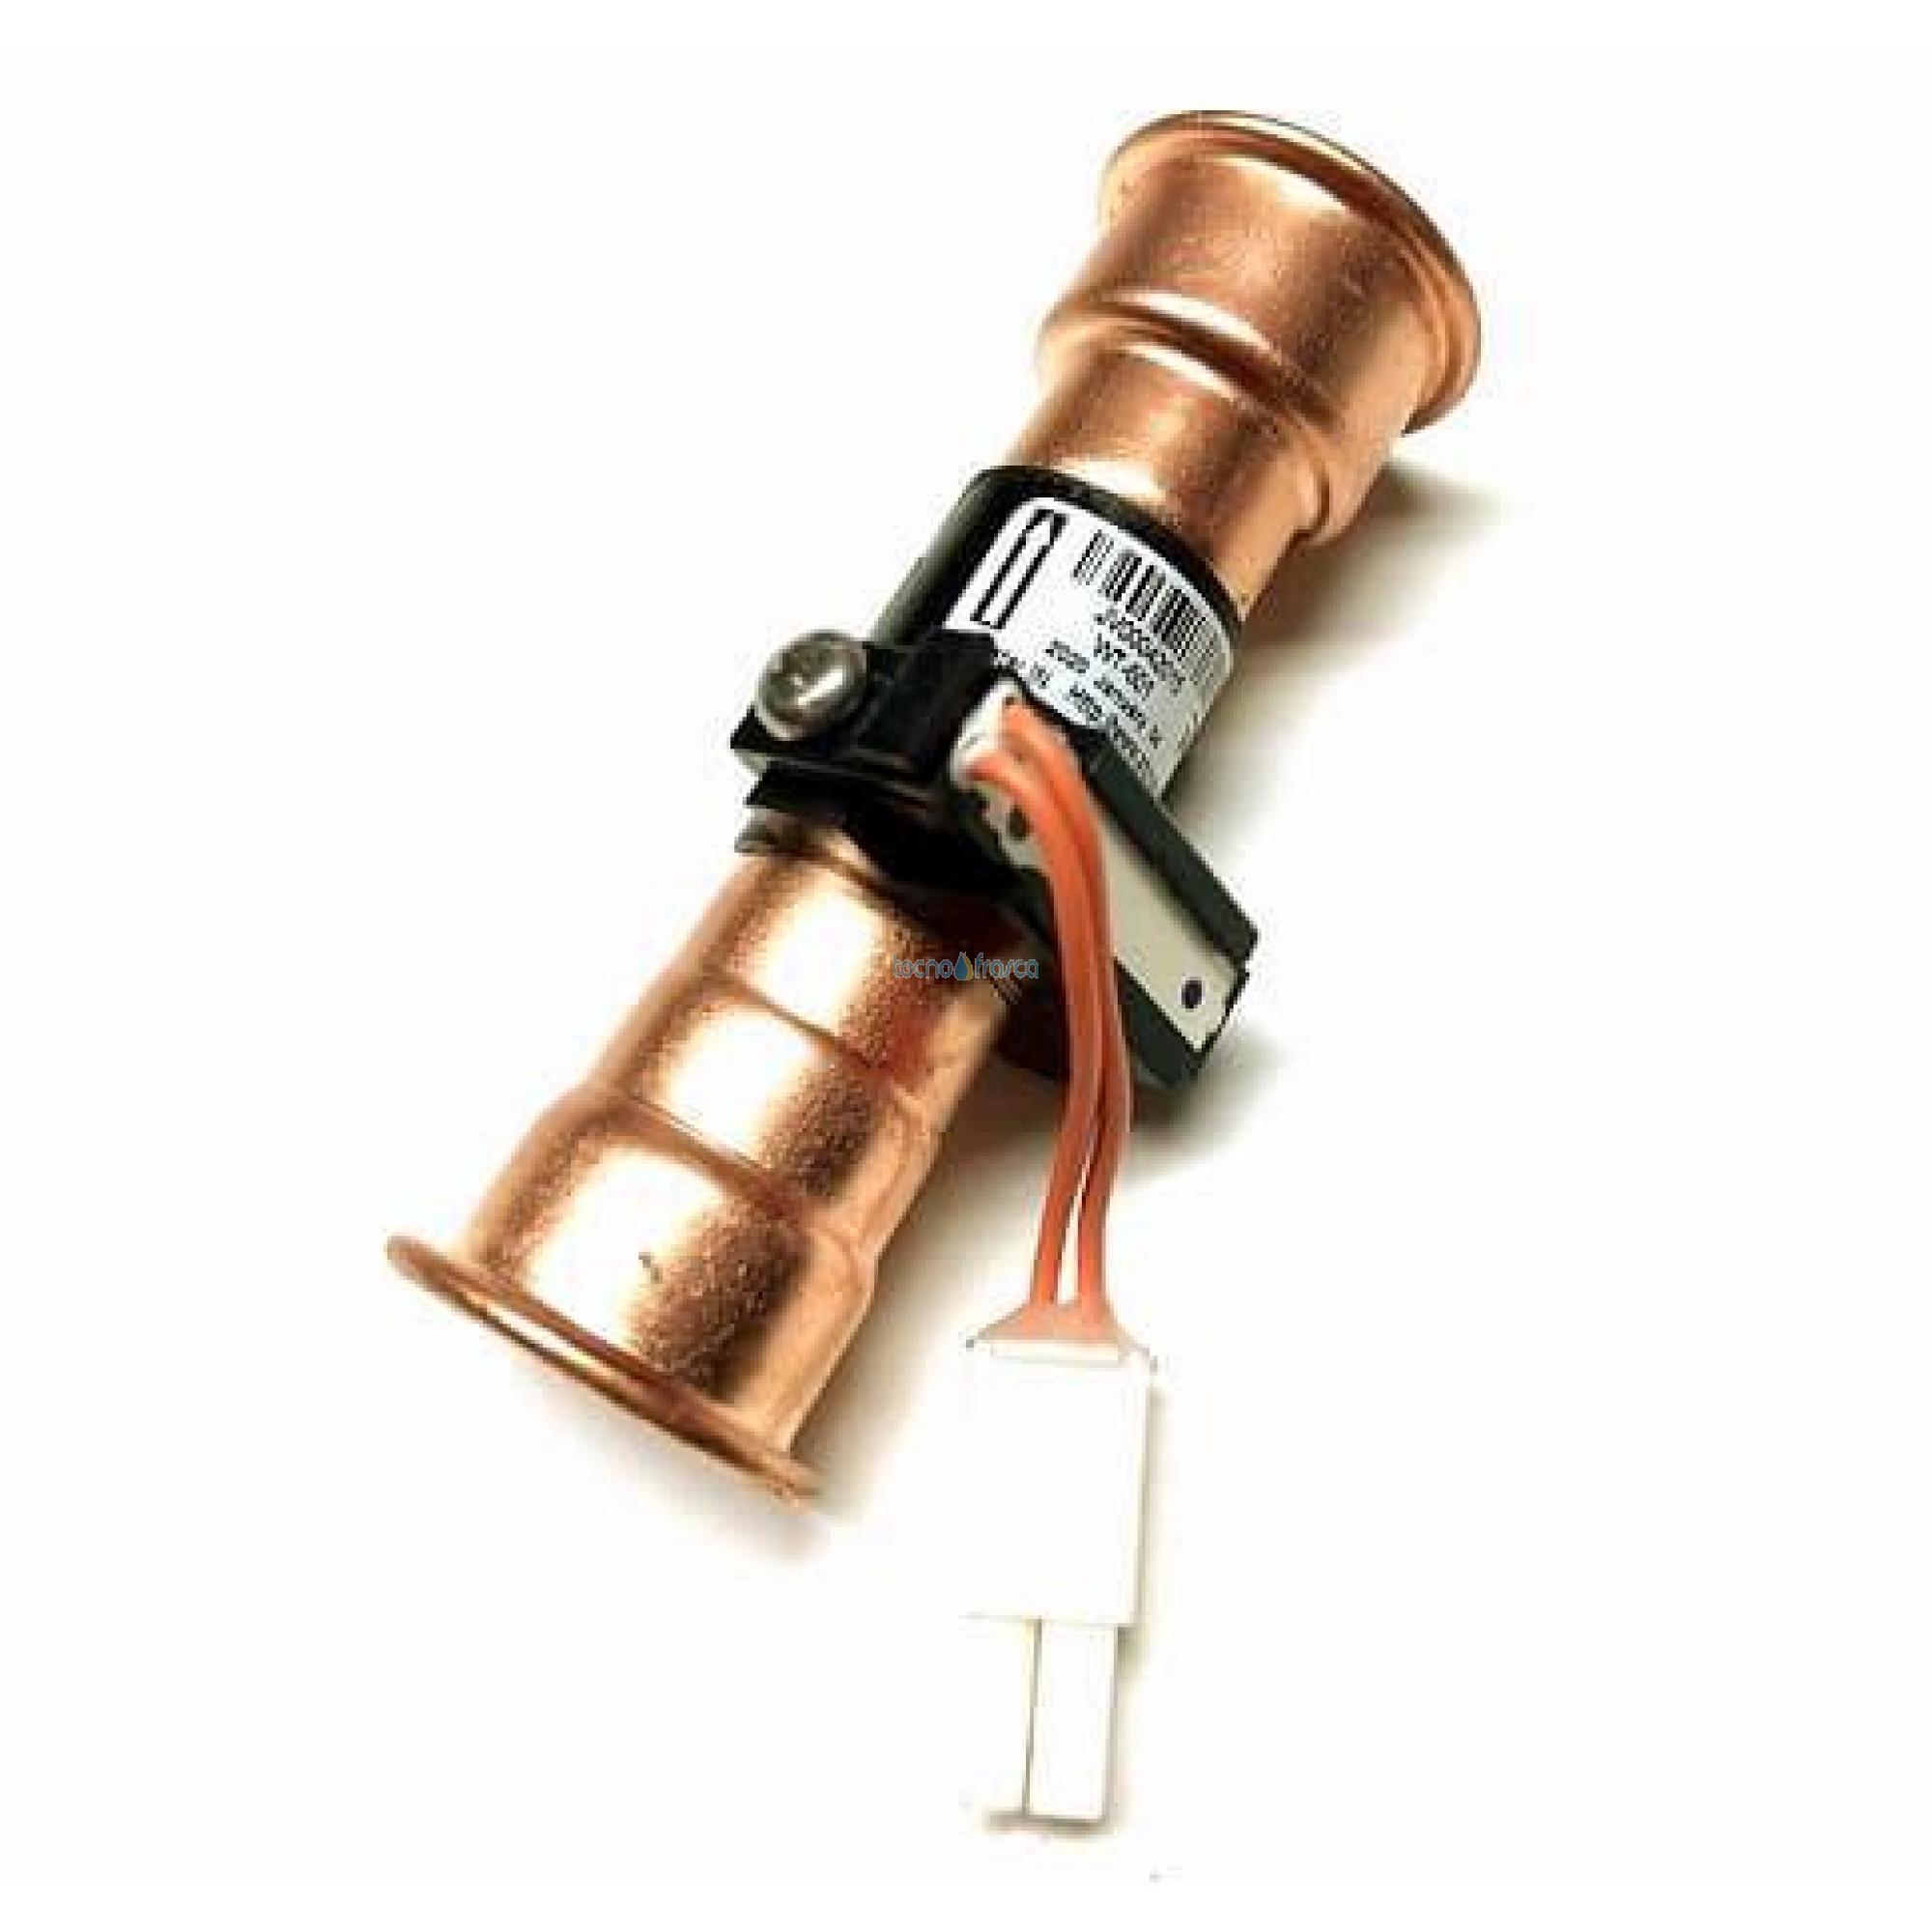 Beretta flussometro scaldabagno fonte lx 11 fonte lx 14 20155455